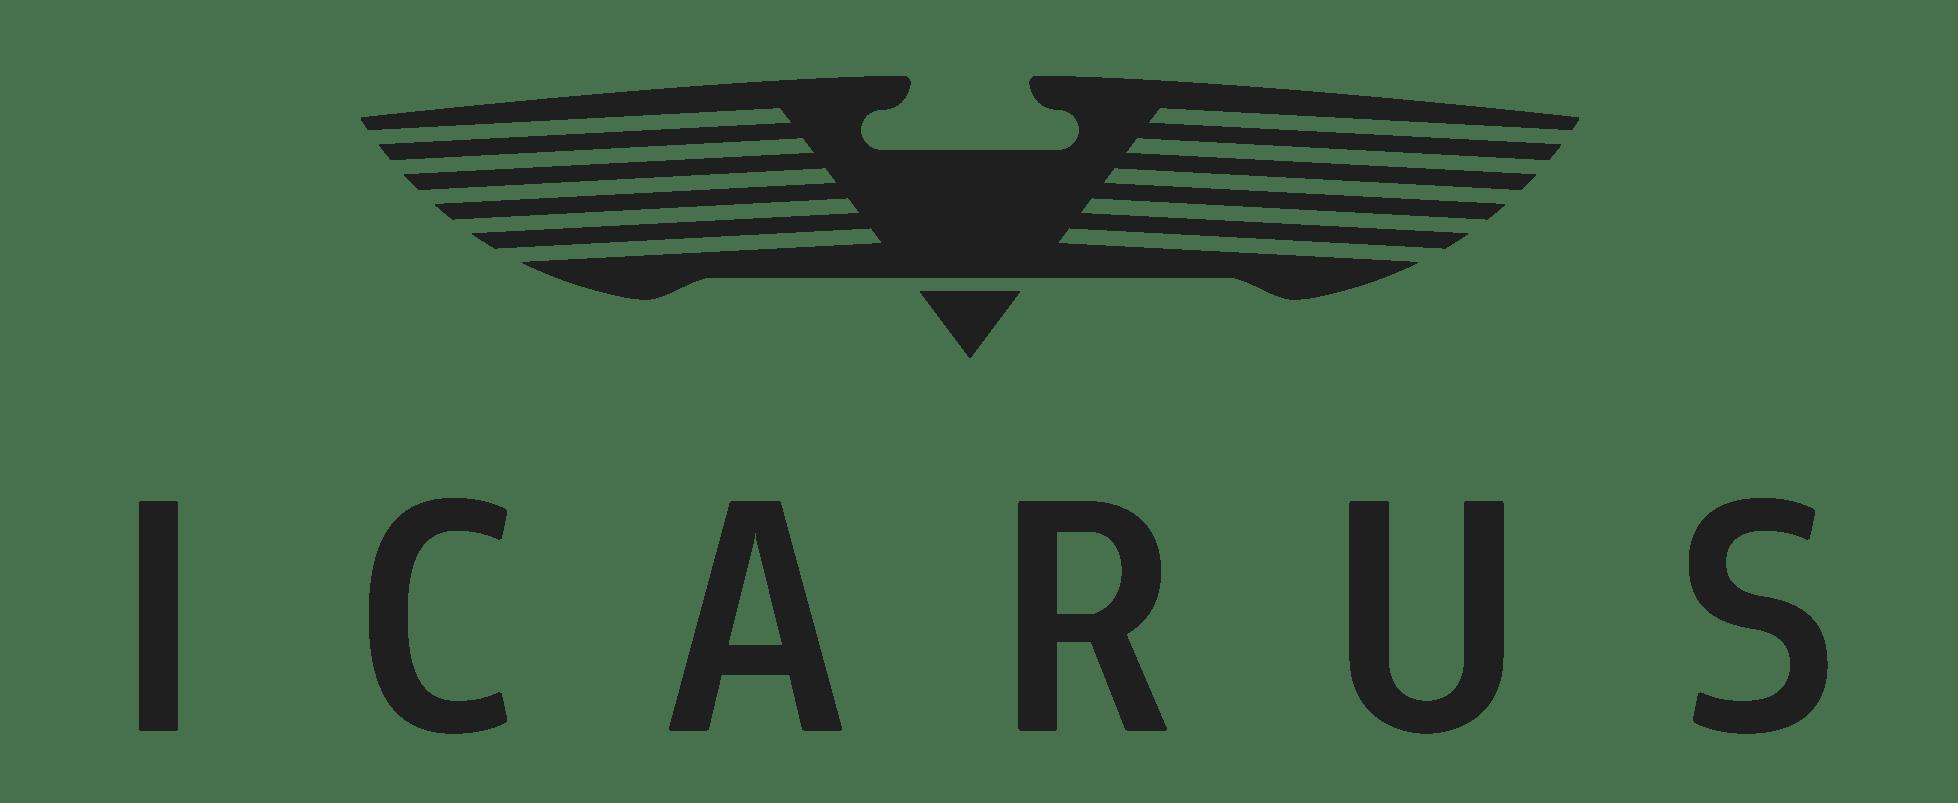 Icarus Aero Inc.